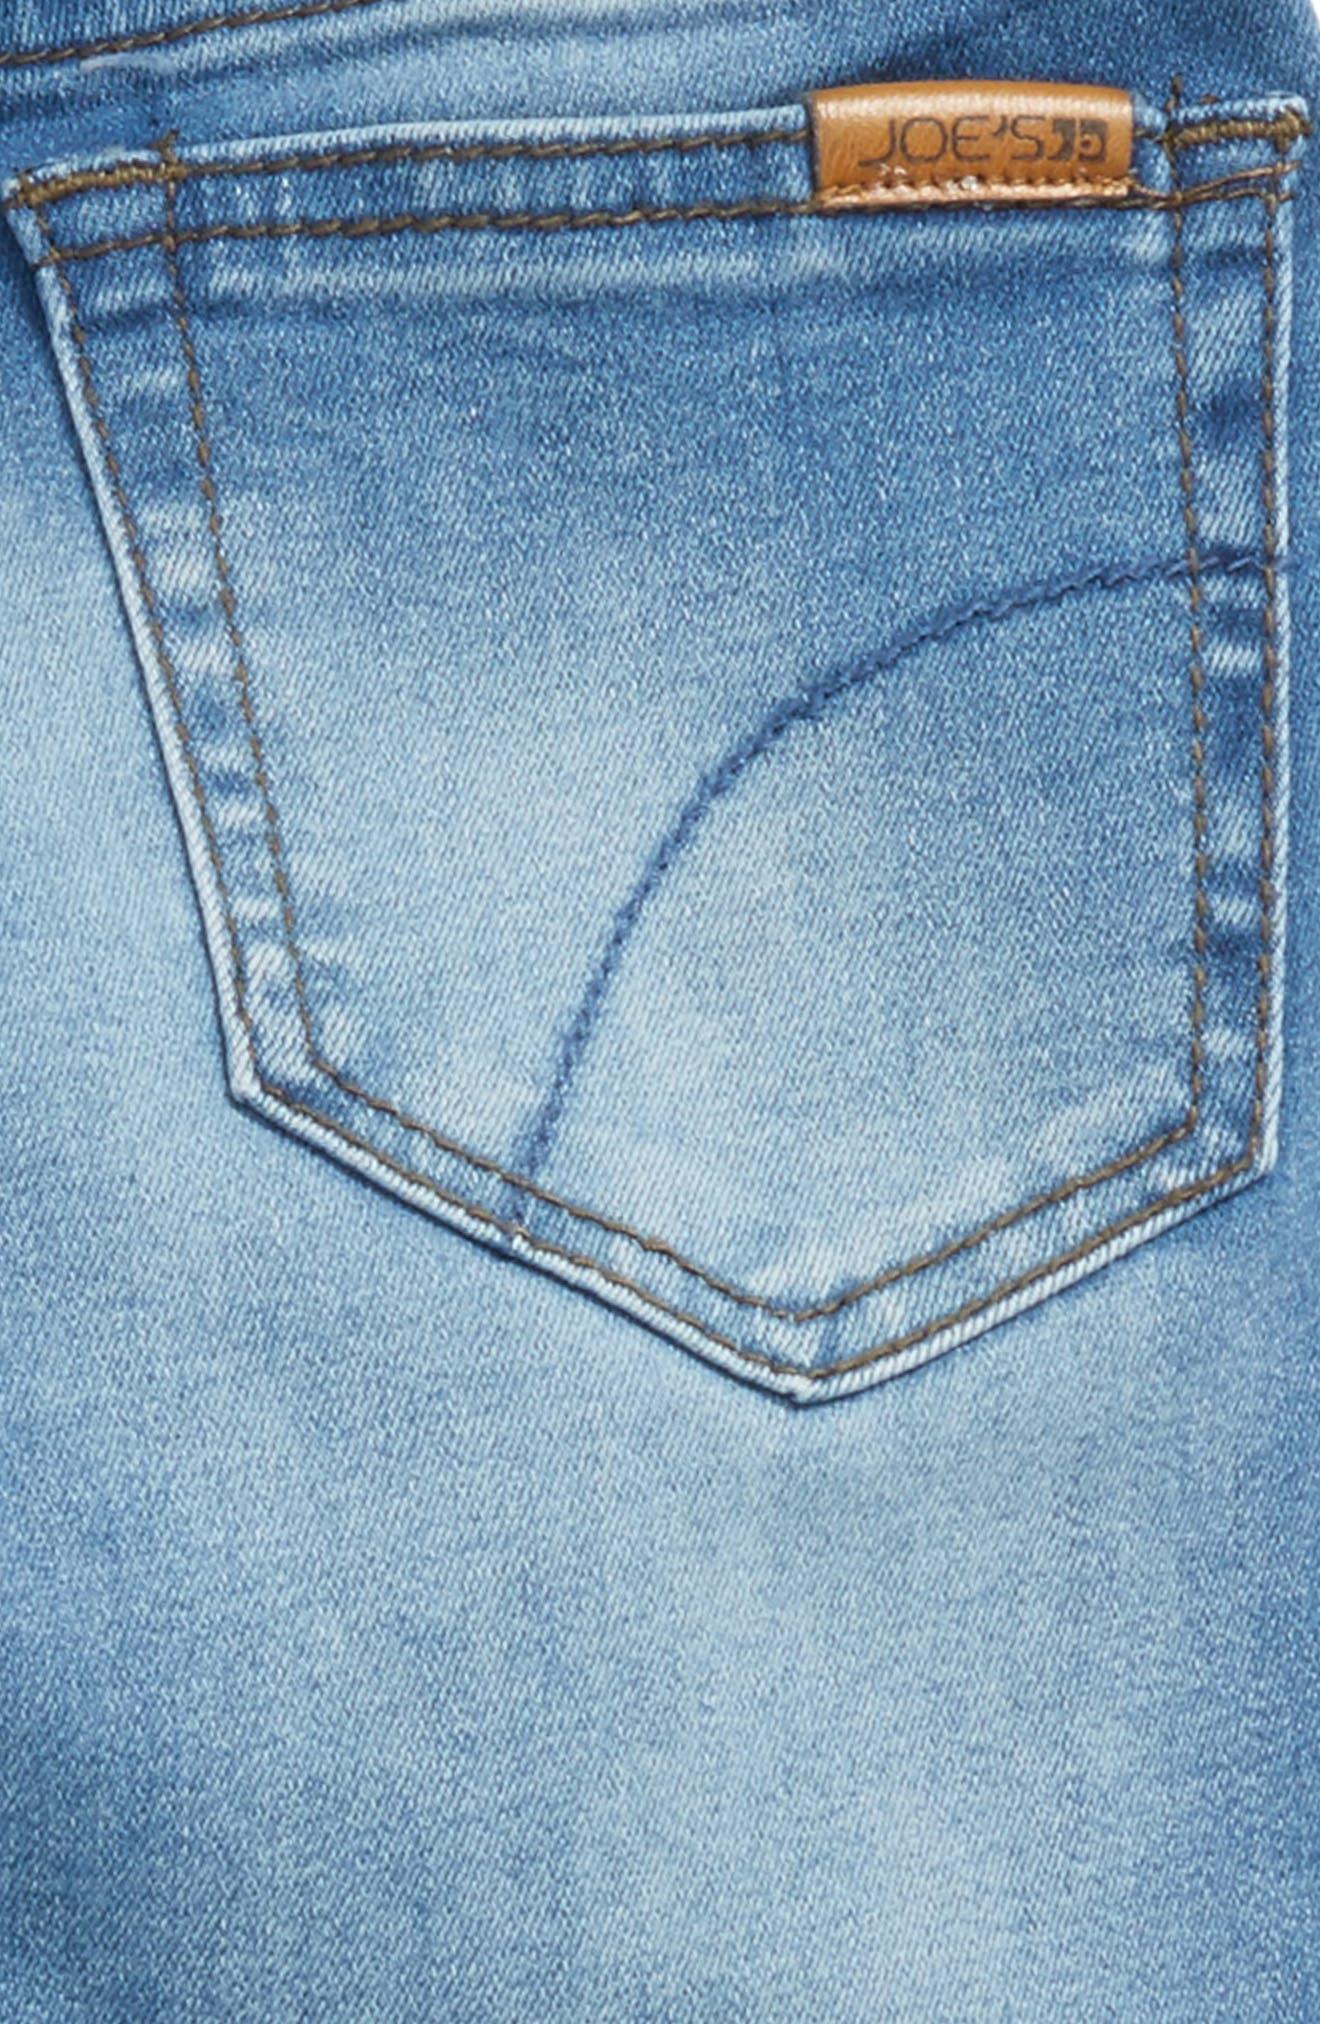 Alternate Image 3  - Joe's Rad Slim Fit Stretch Jeans (Toddler Boys & Little Boys)